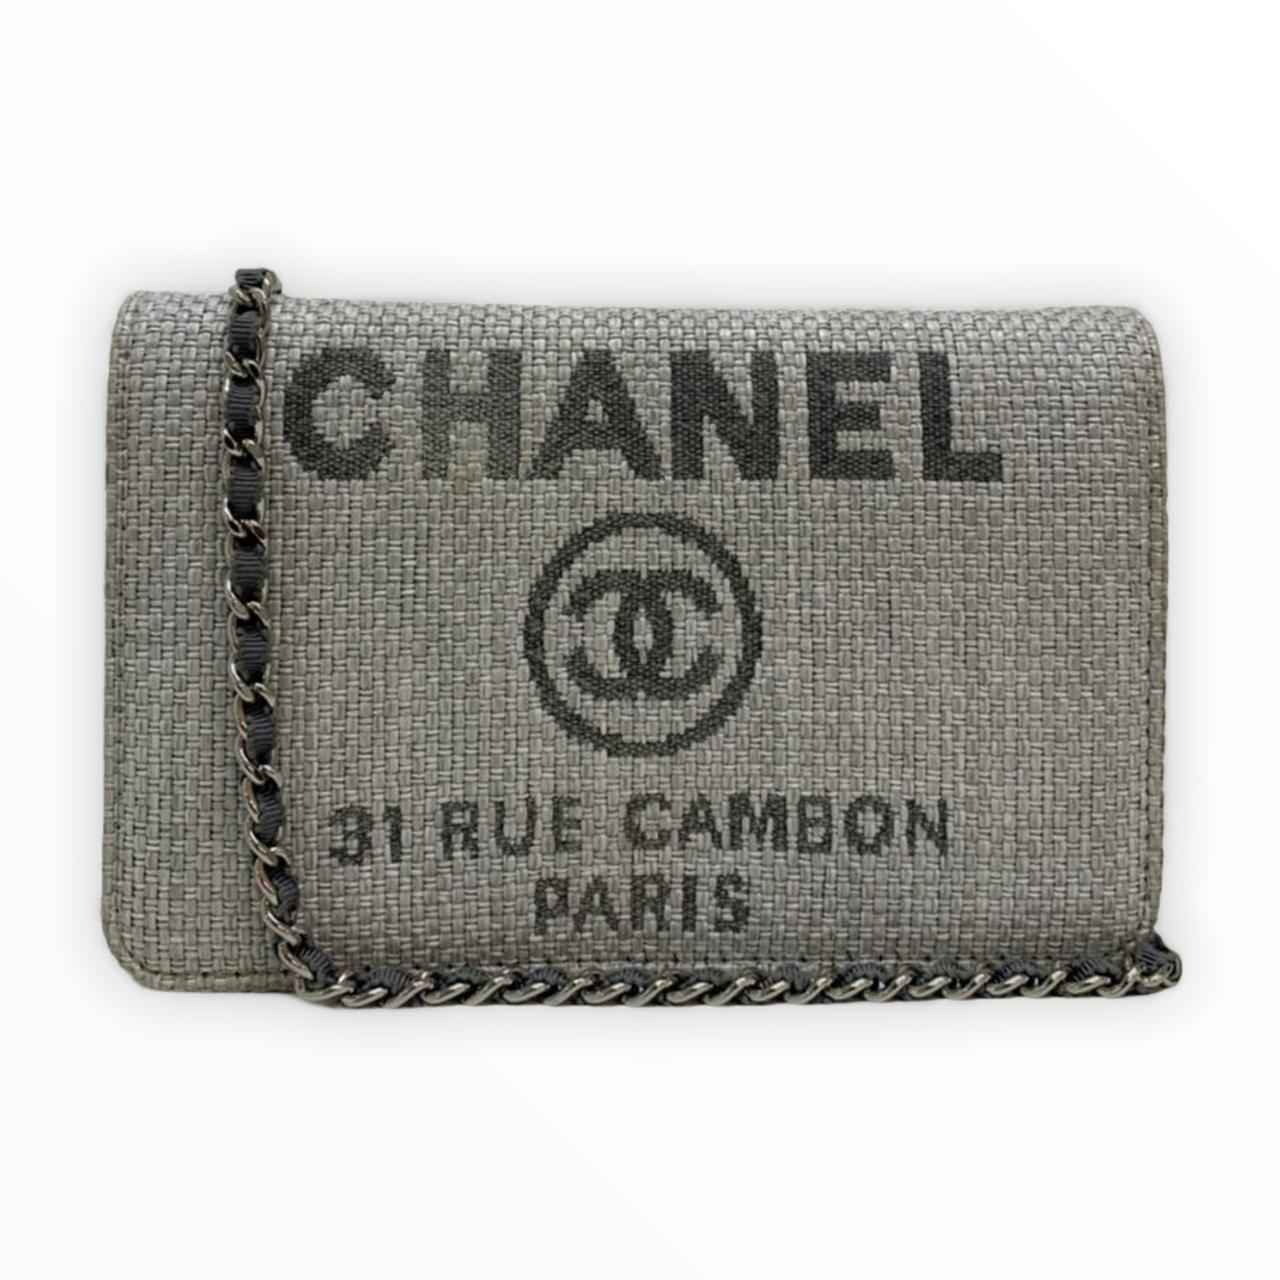 Bolsa Chanel Deauville Wallet on Chain